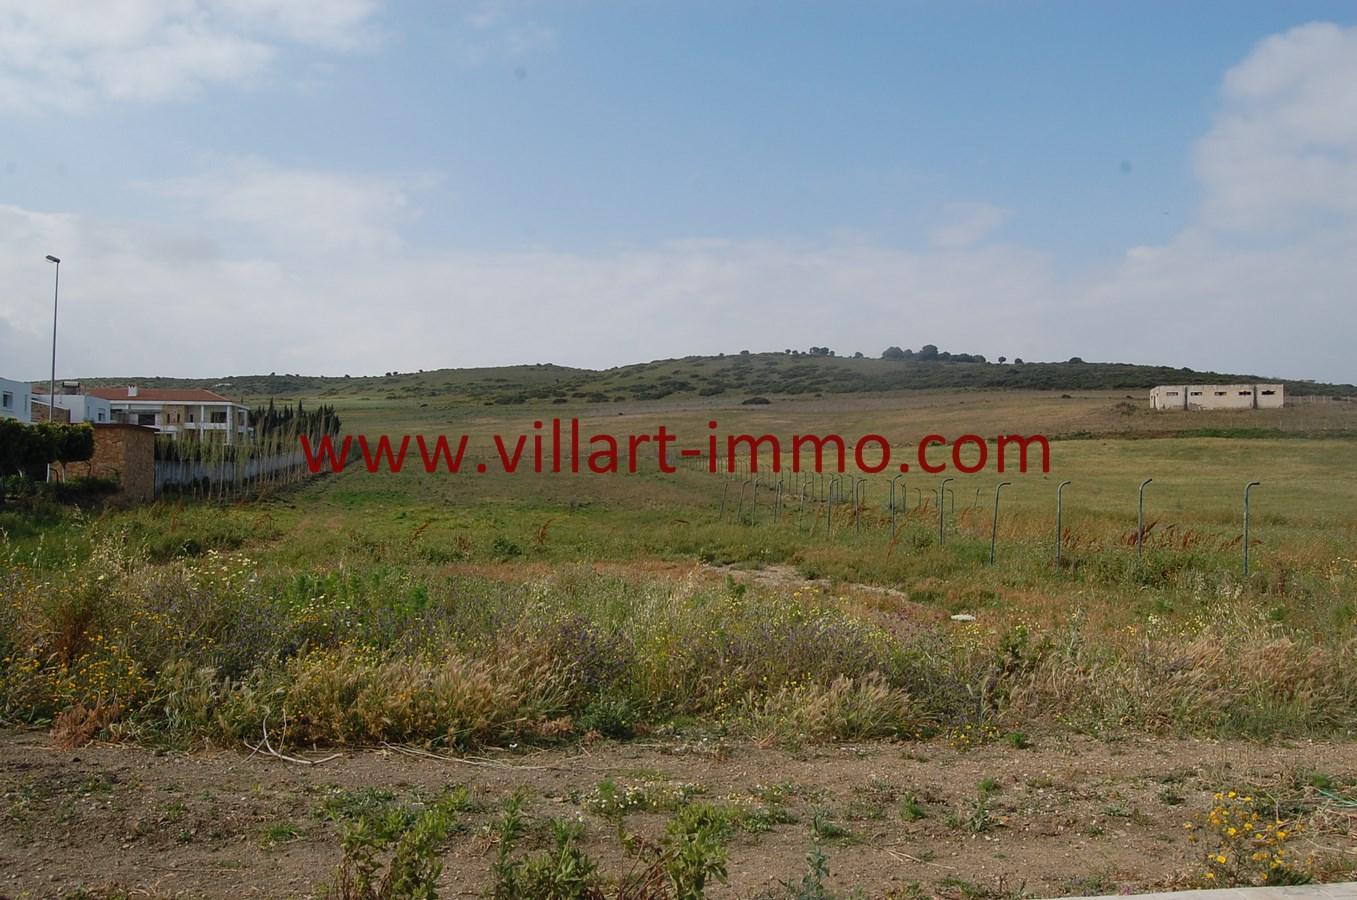 1-Vente-Terrain-Tanger-Jbilat-VT26-Villart Immo